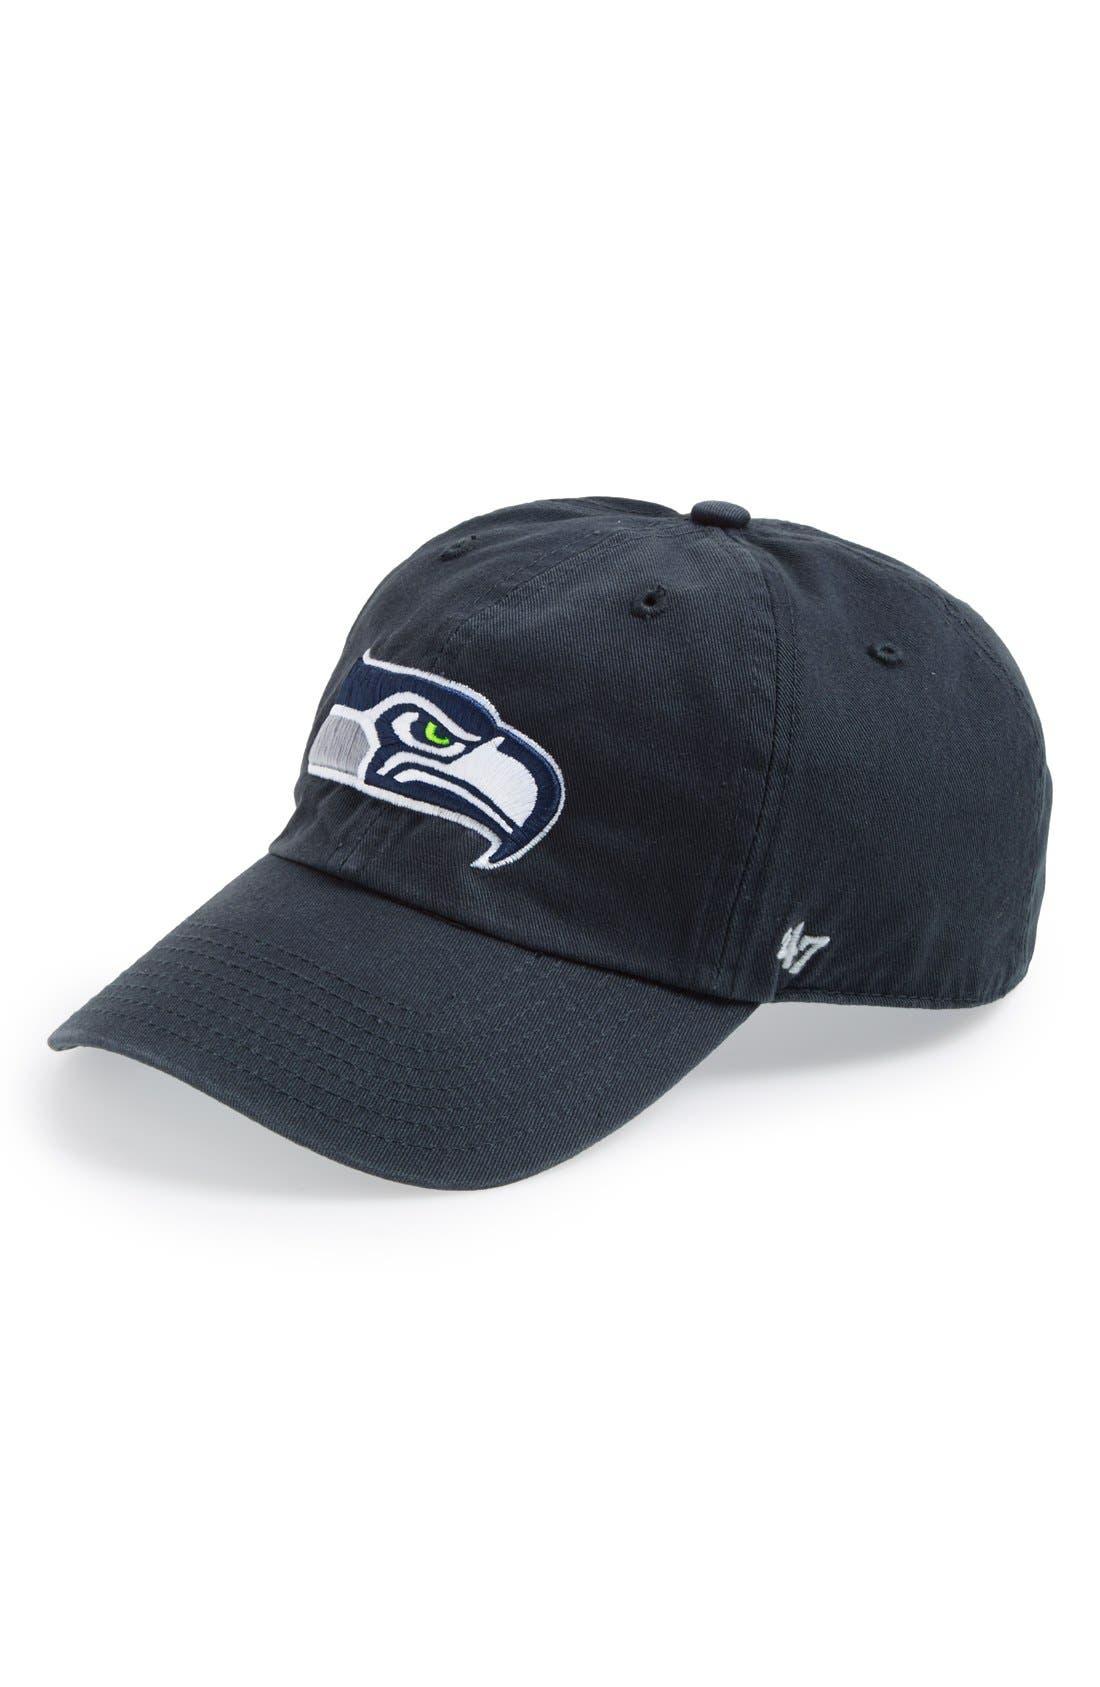 '47 'Seattle Seahawks - Clean Up' Cap